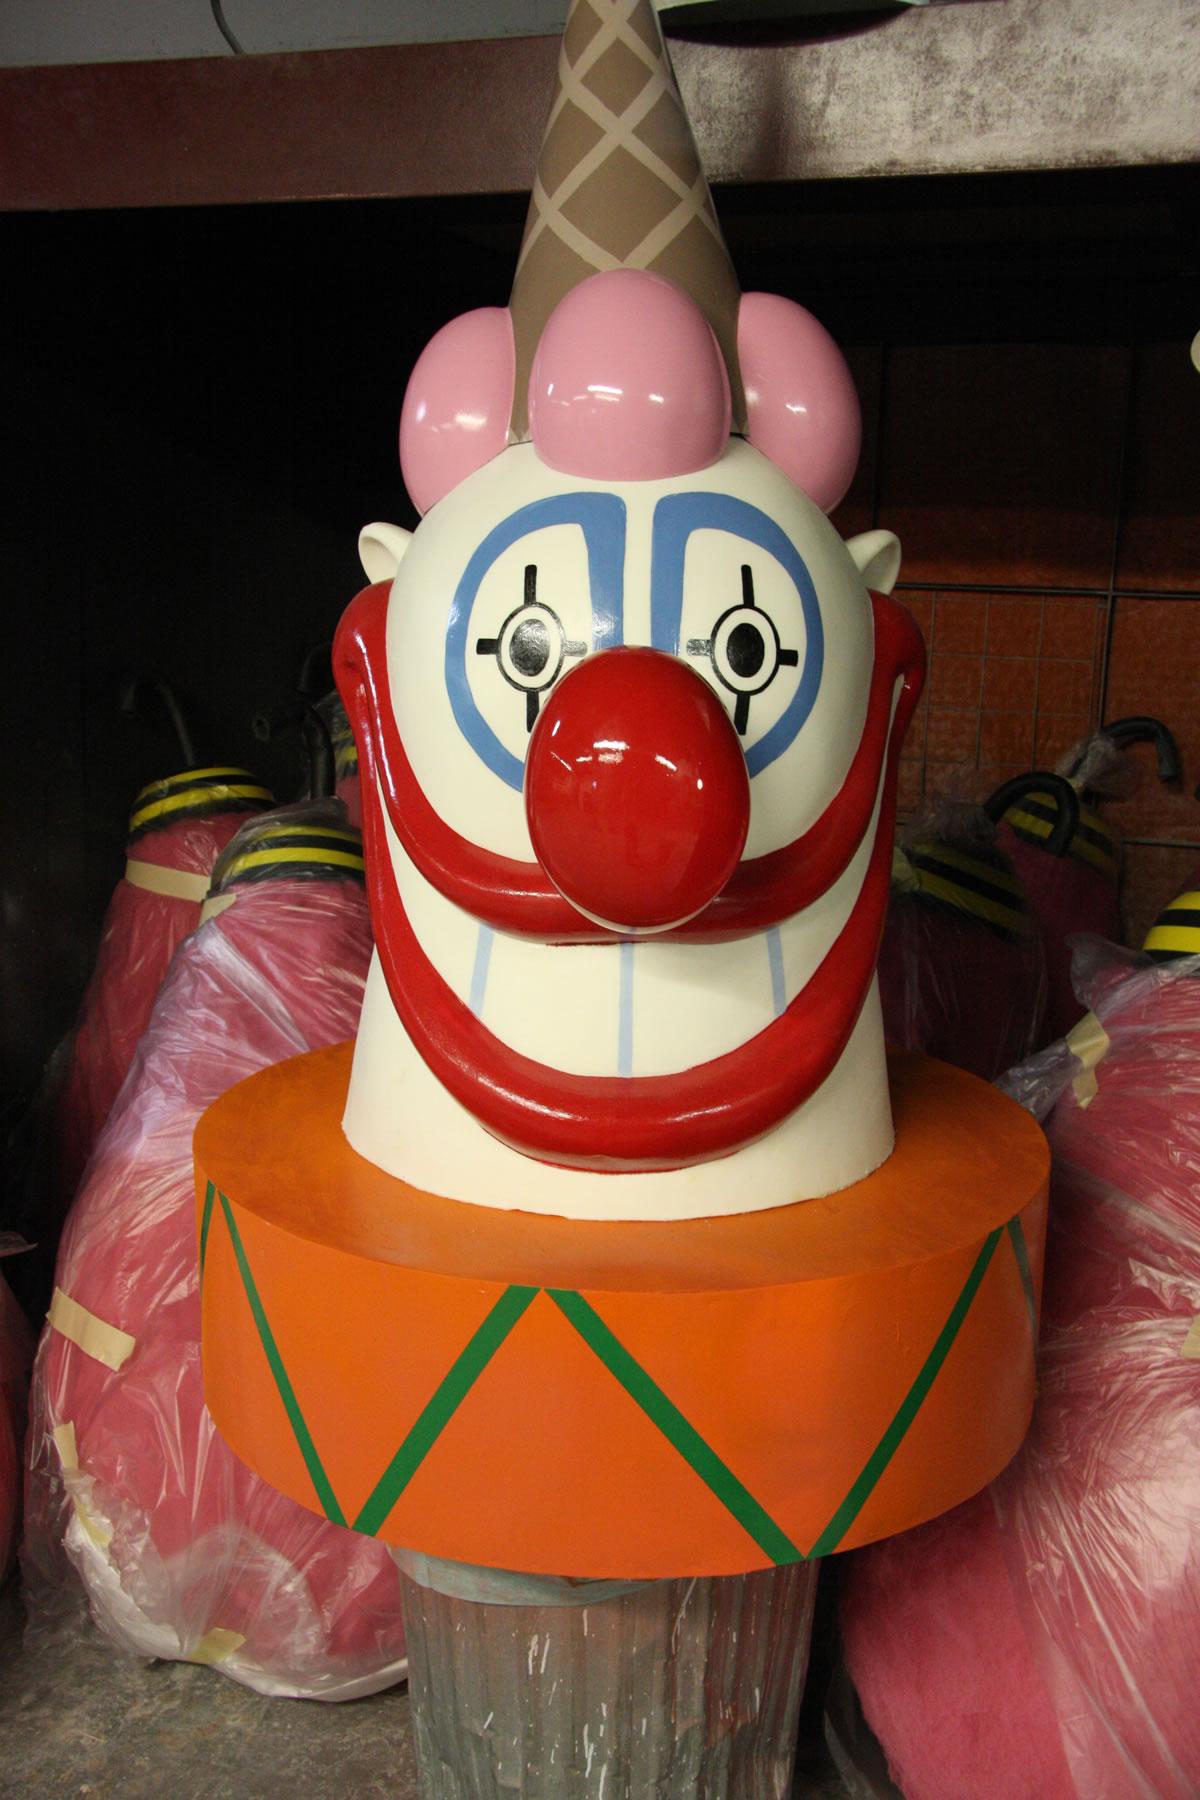 'Killer Klown' Ice cream truck reproduction